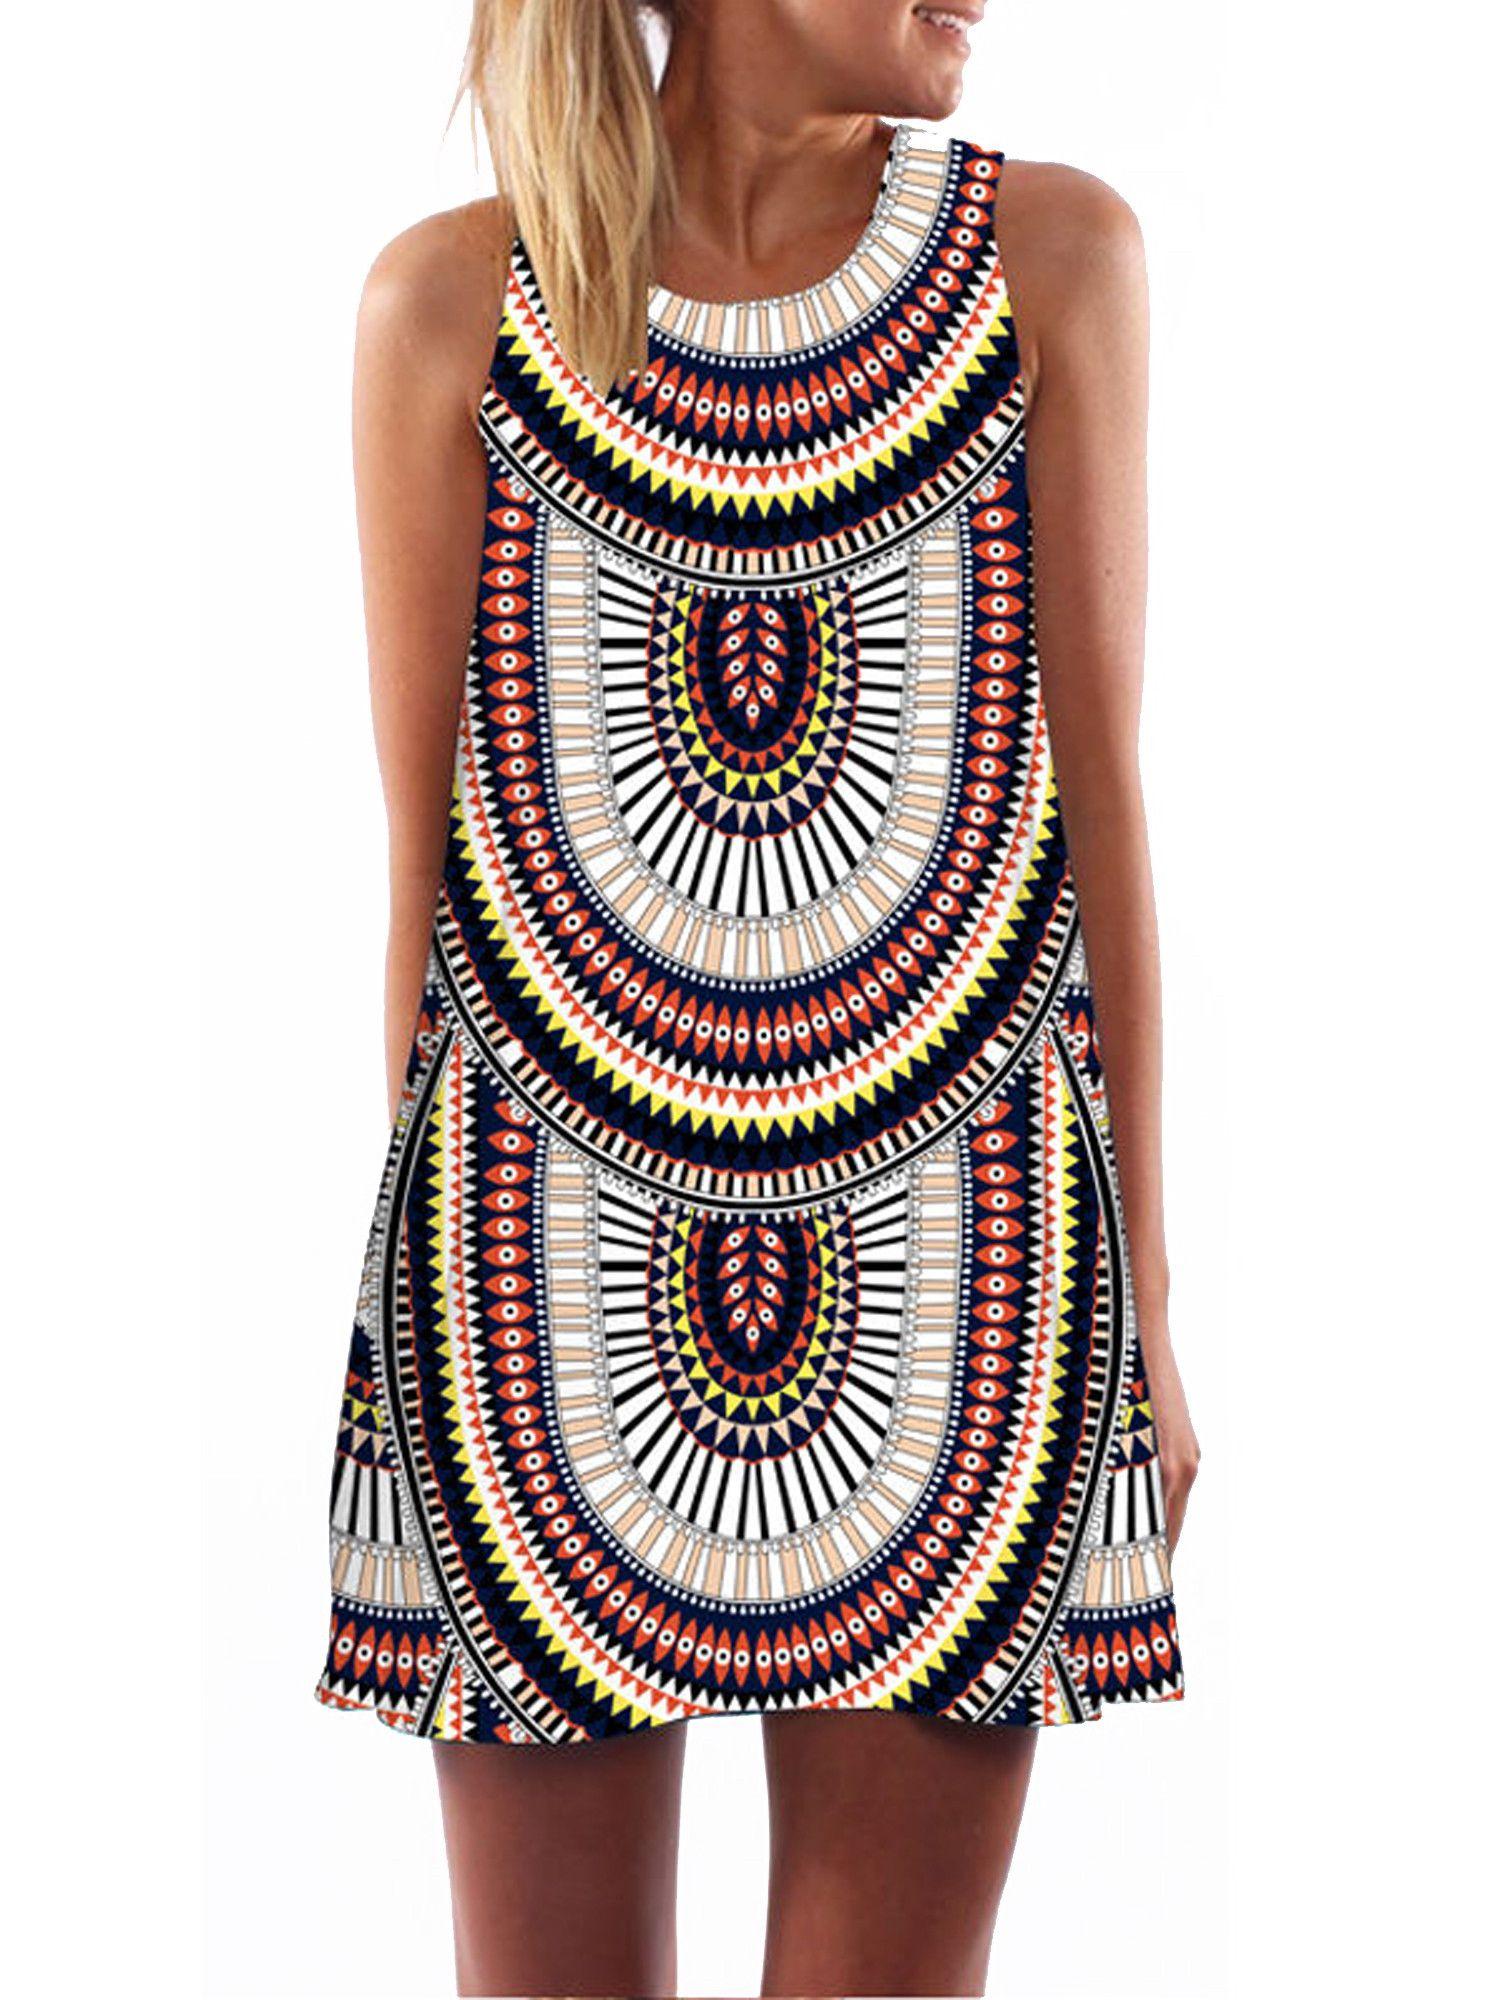 Focusnorm Focusnorm Womens Boho Summer Casual T Shirt Dresses Beach Cover Up Plain Tank Dress Tunic Top Sleeveless Mini Dress Mini Dress Sleeveless Dresses Casual [ 2000 x 1500 Pixel ]